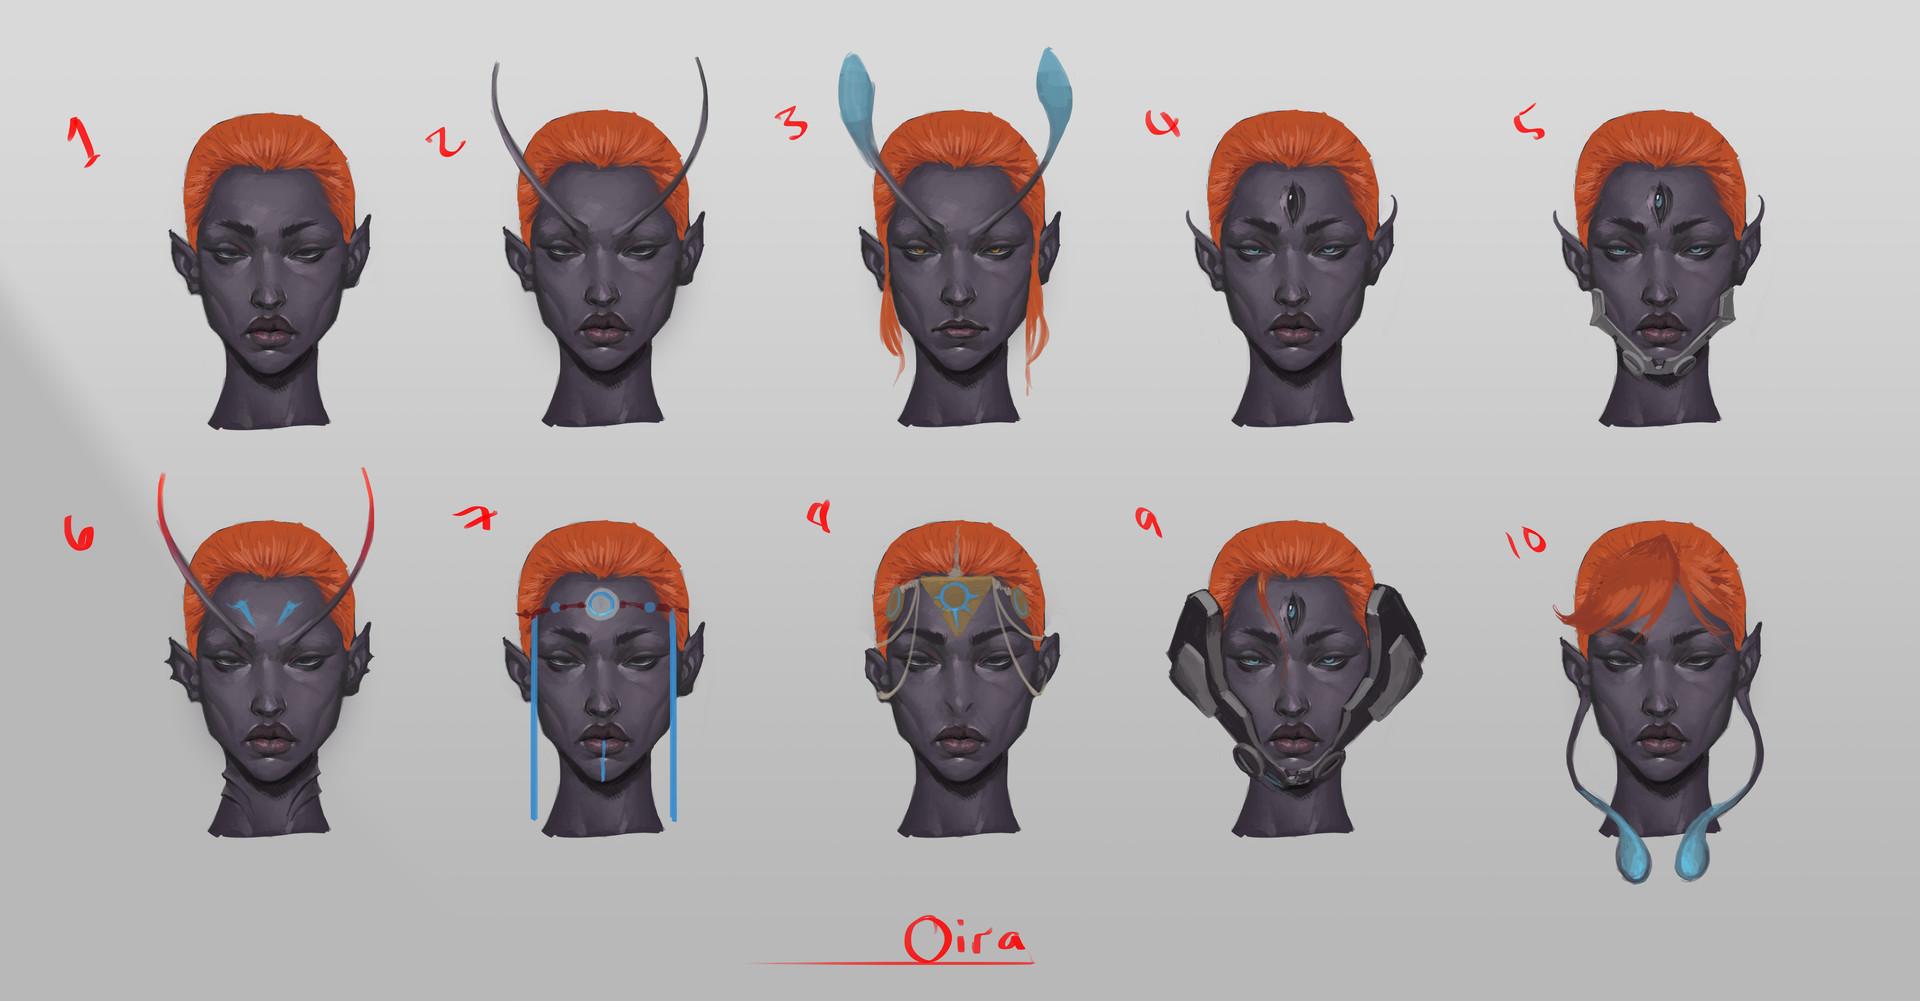 Tumo mere alien female busts